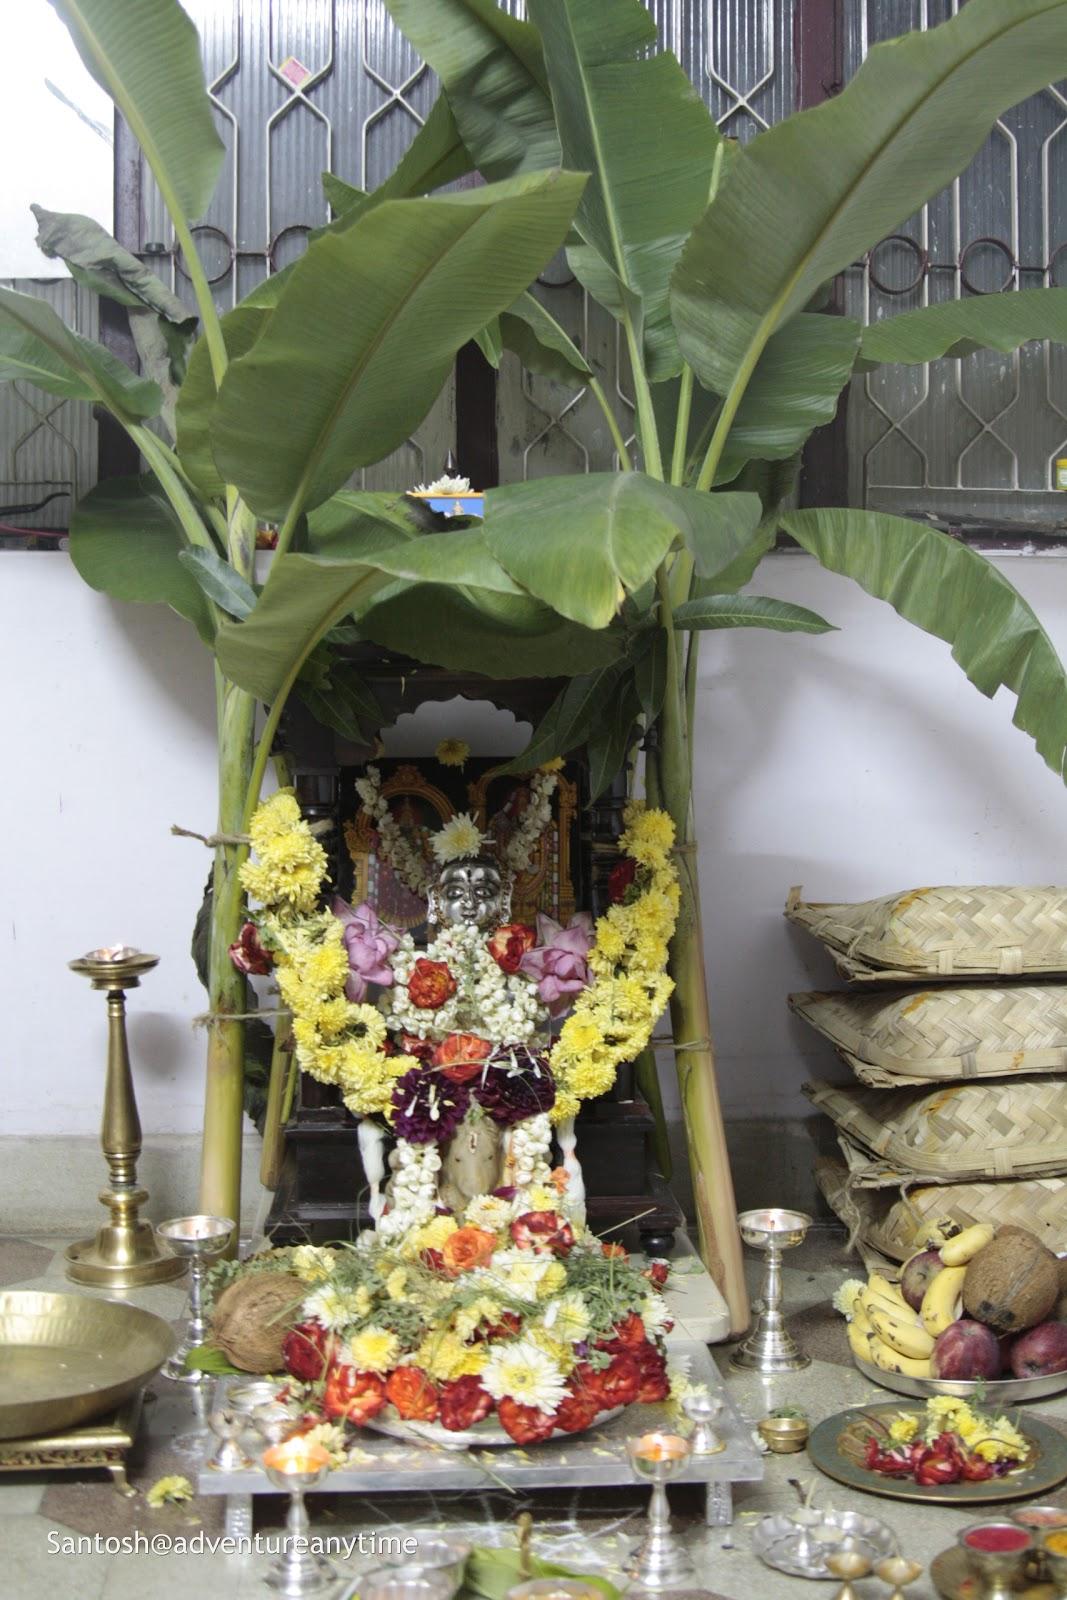 Ganesh Chaturthi Celebrations - Transcending Virtual